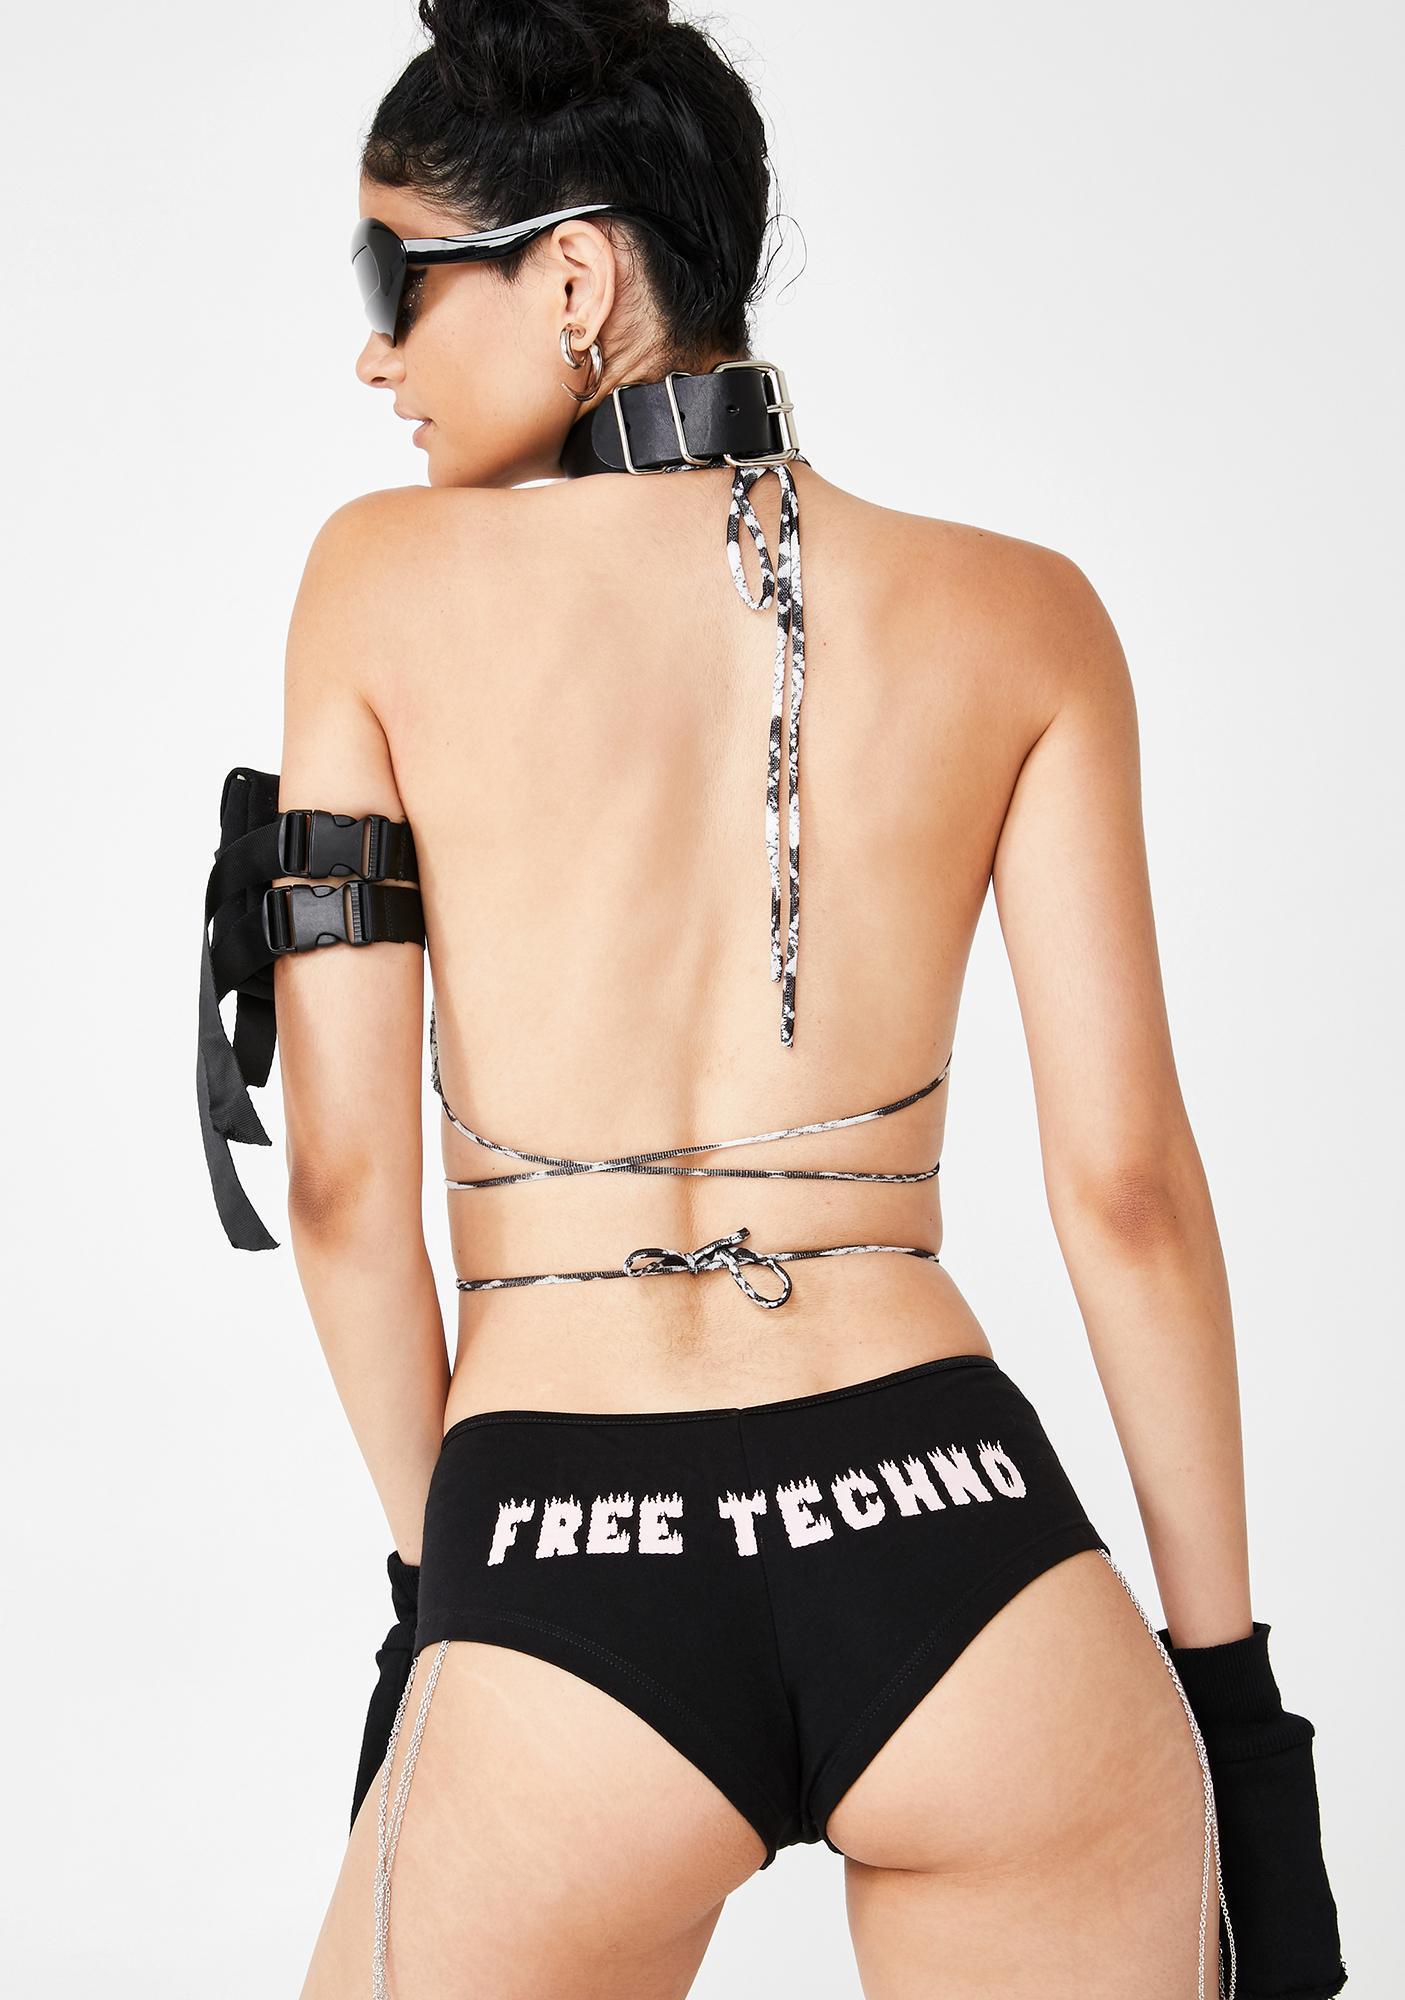 W.I.A Free Techno Chain Shorts